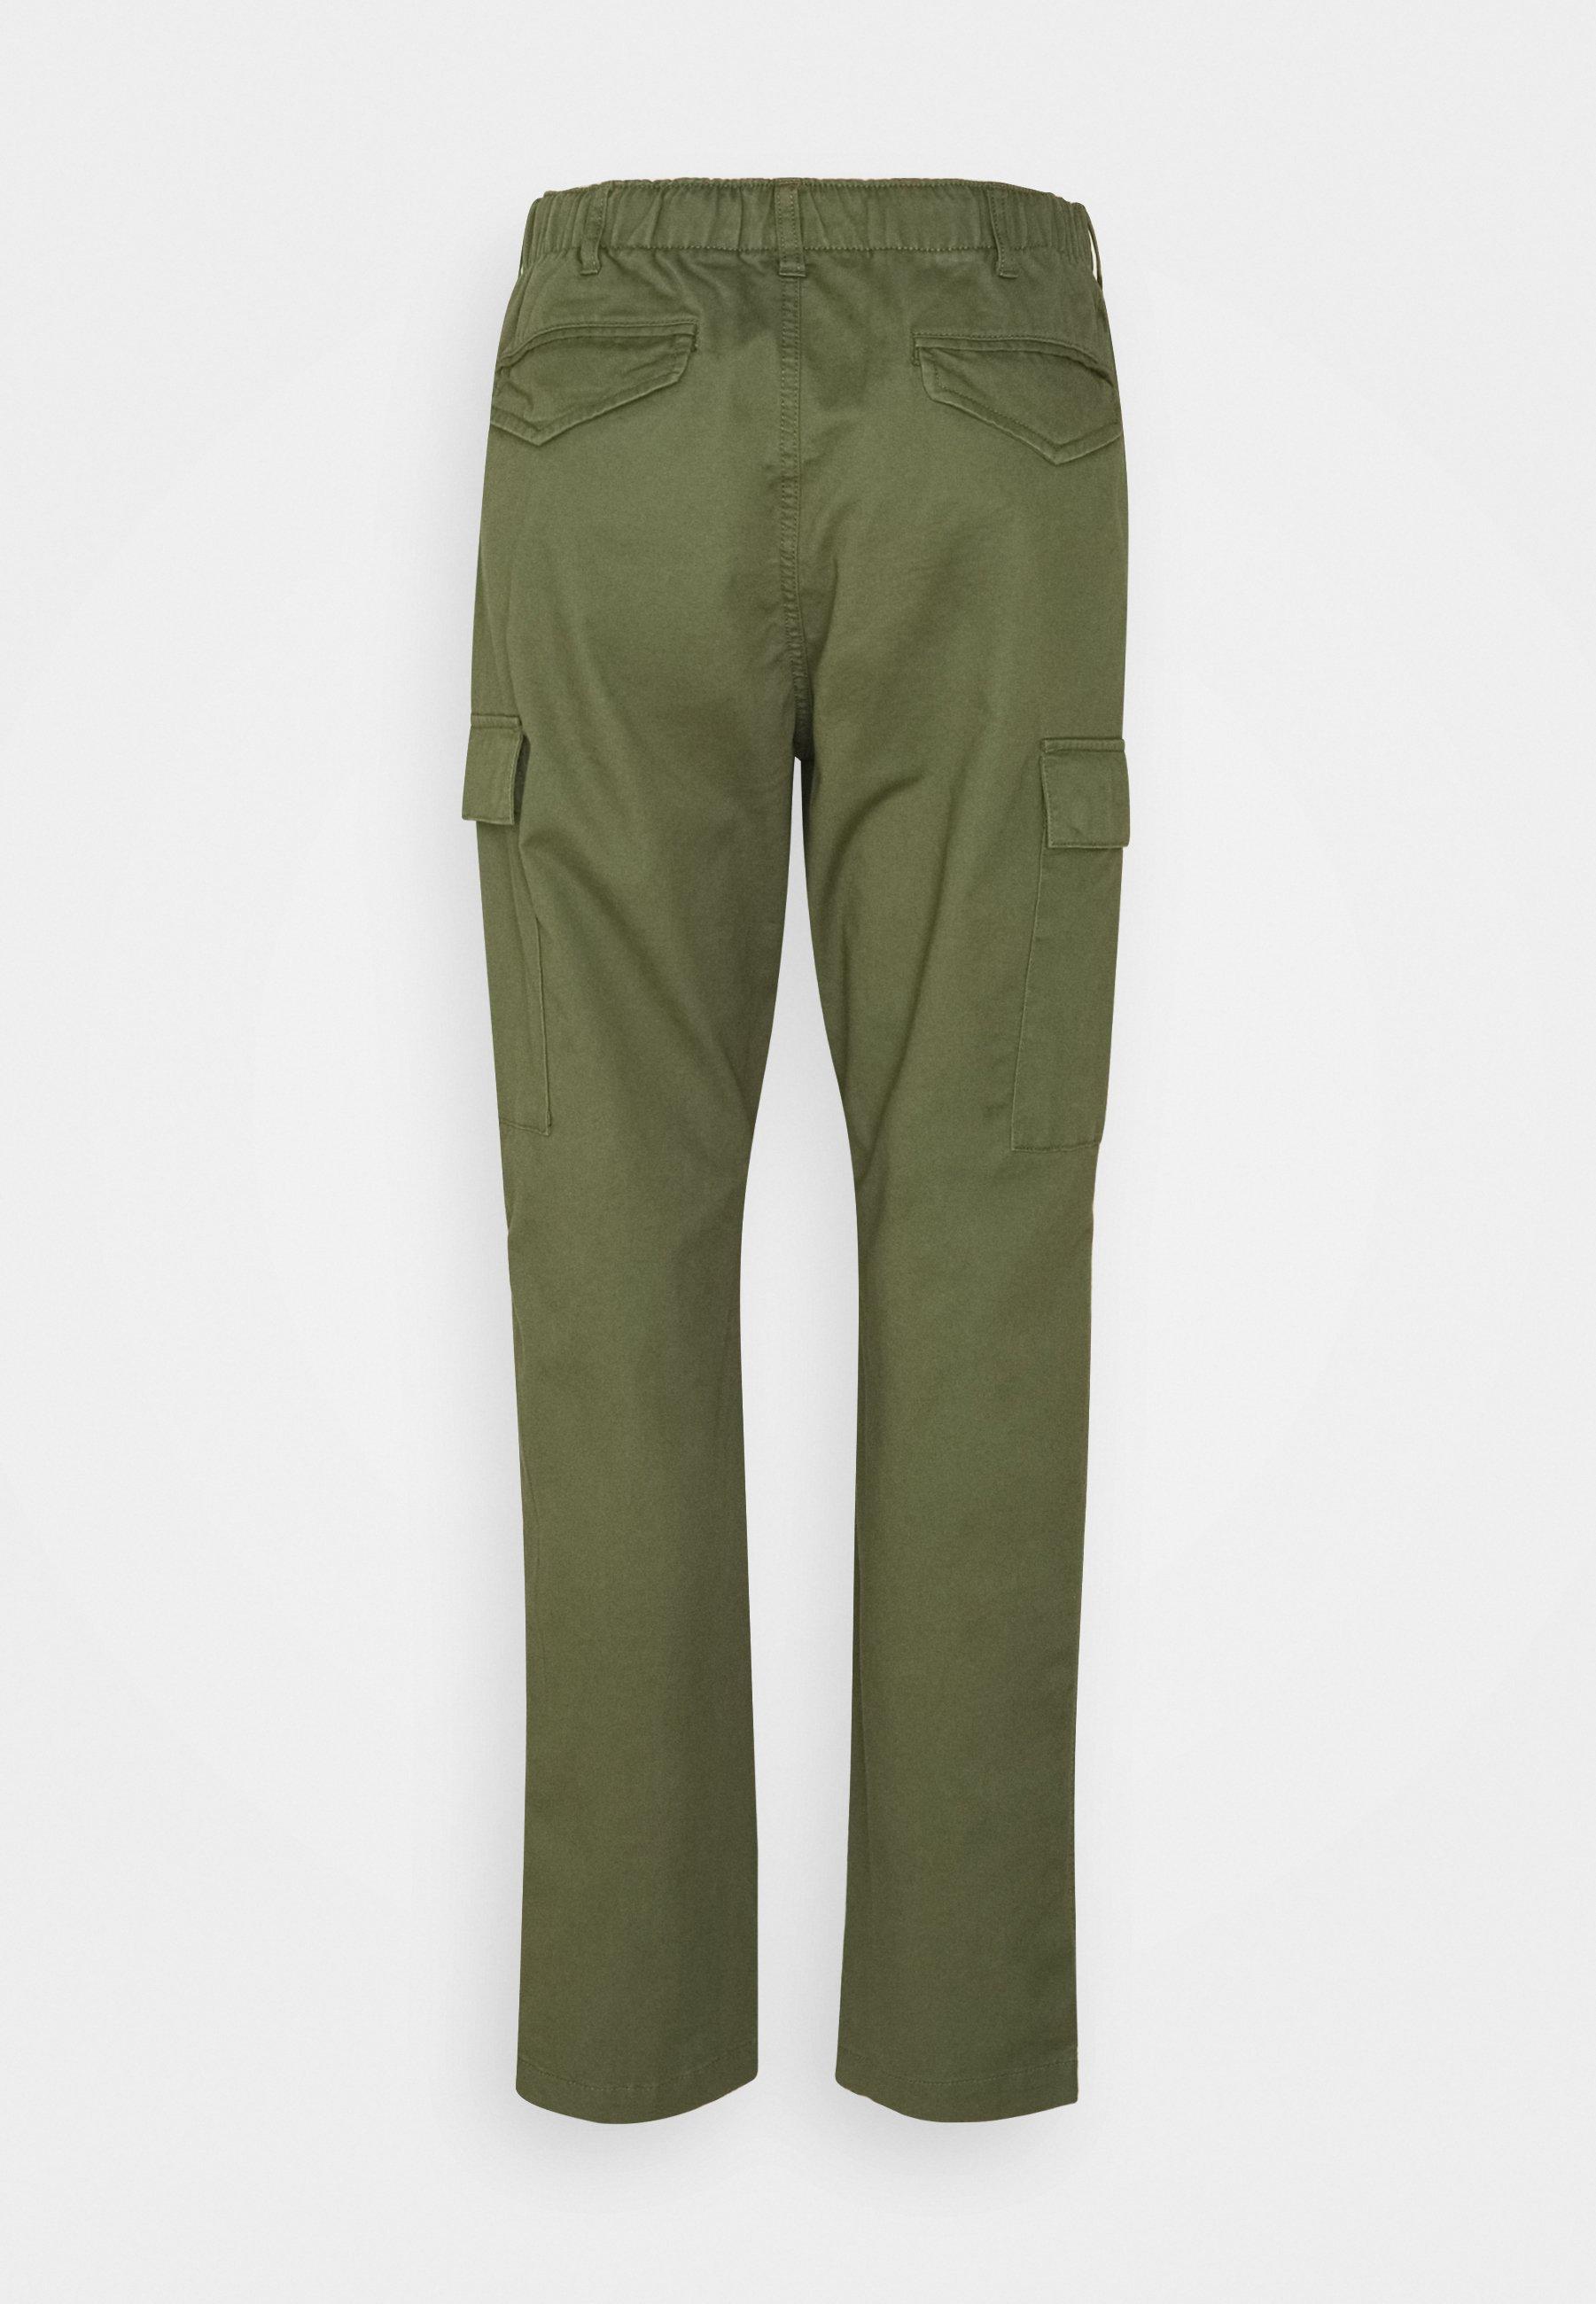 Homme STRETCH SLIM FIT TWILL CARGO PANT - Pantalon cargo